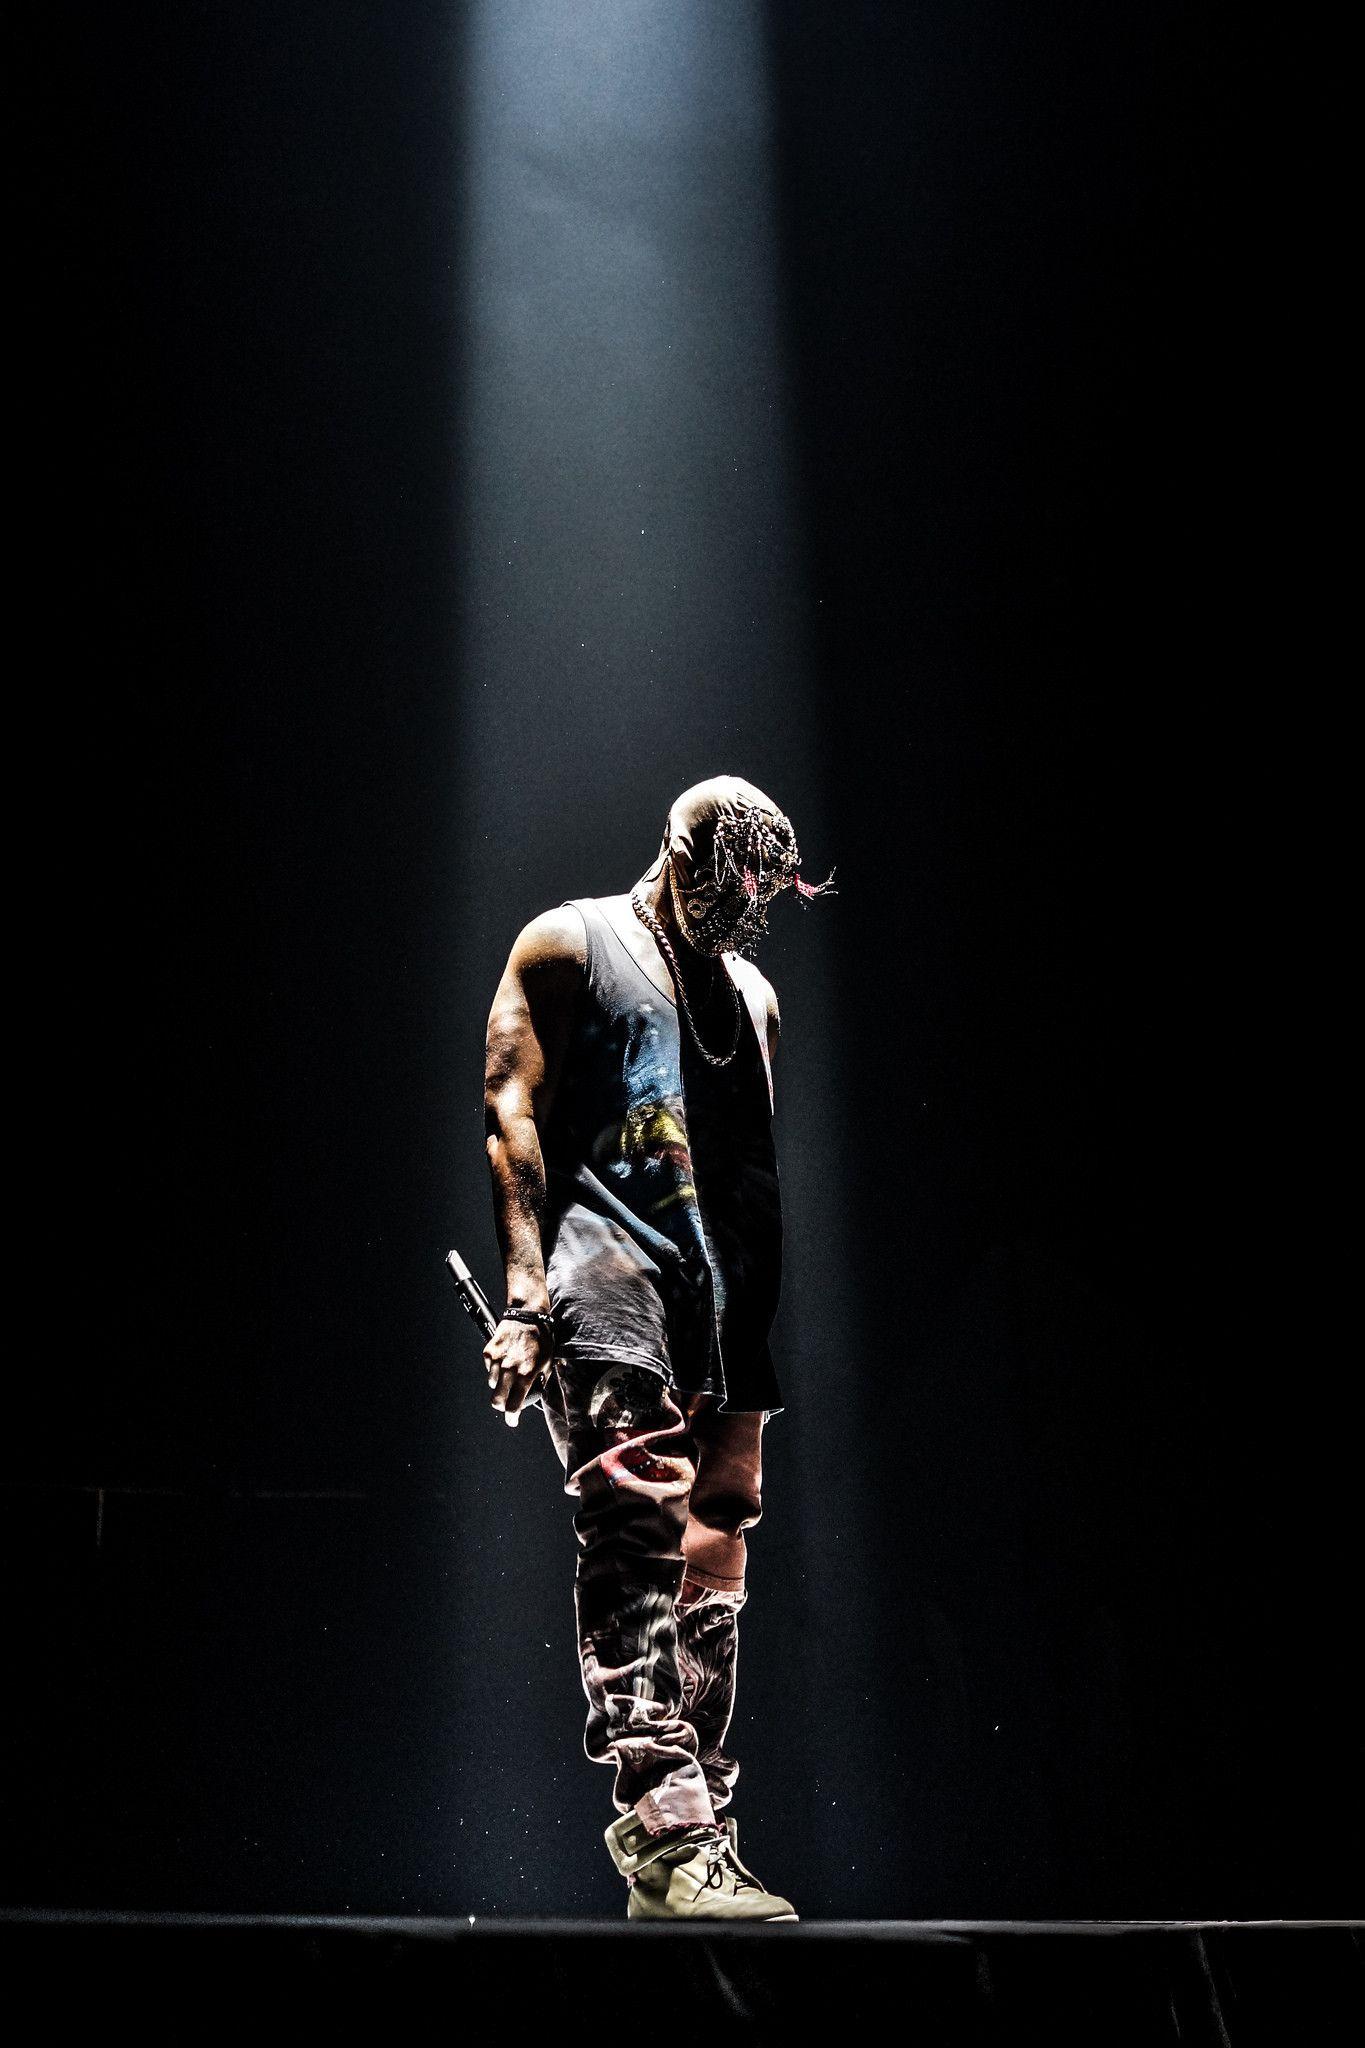 Yeezus Tour Kanye West Wallpaper Kanye West Yeezus Yeezus Tour